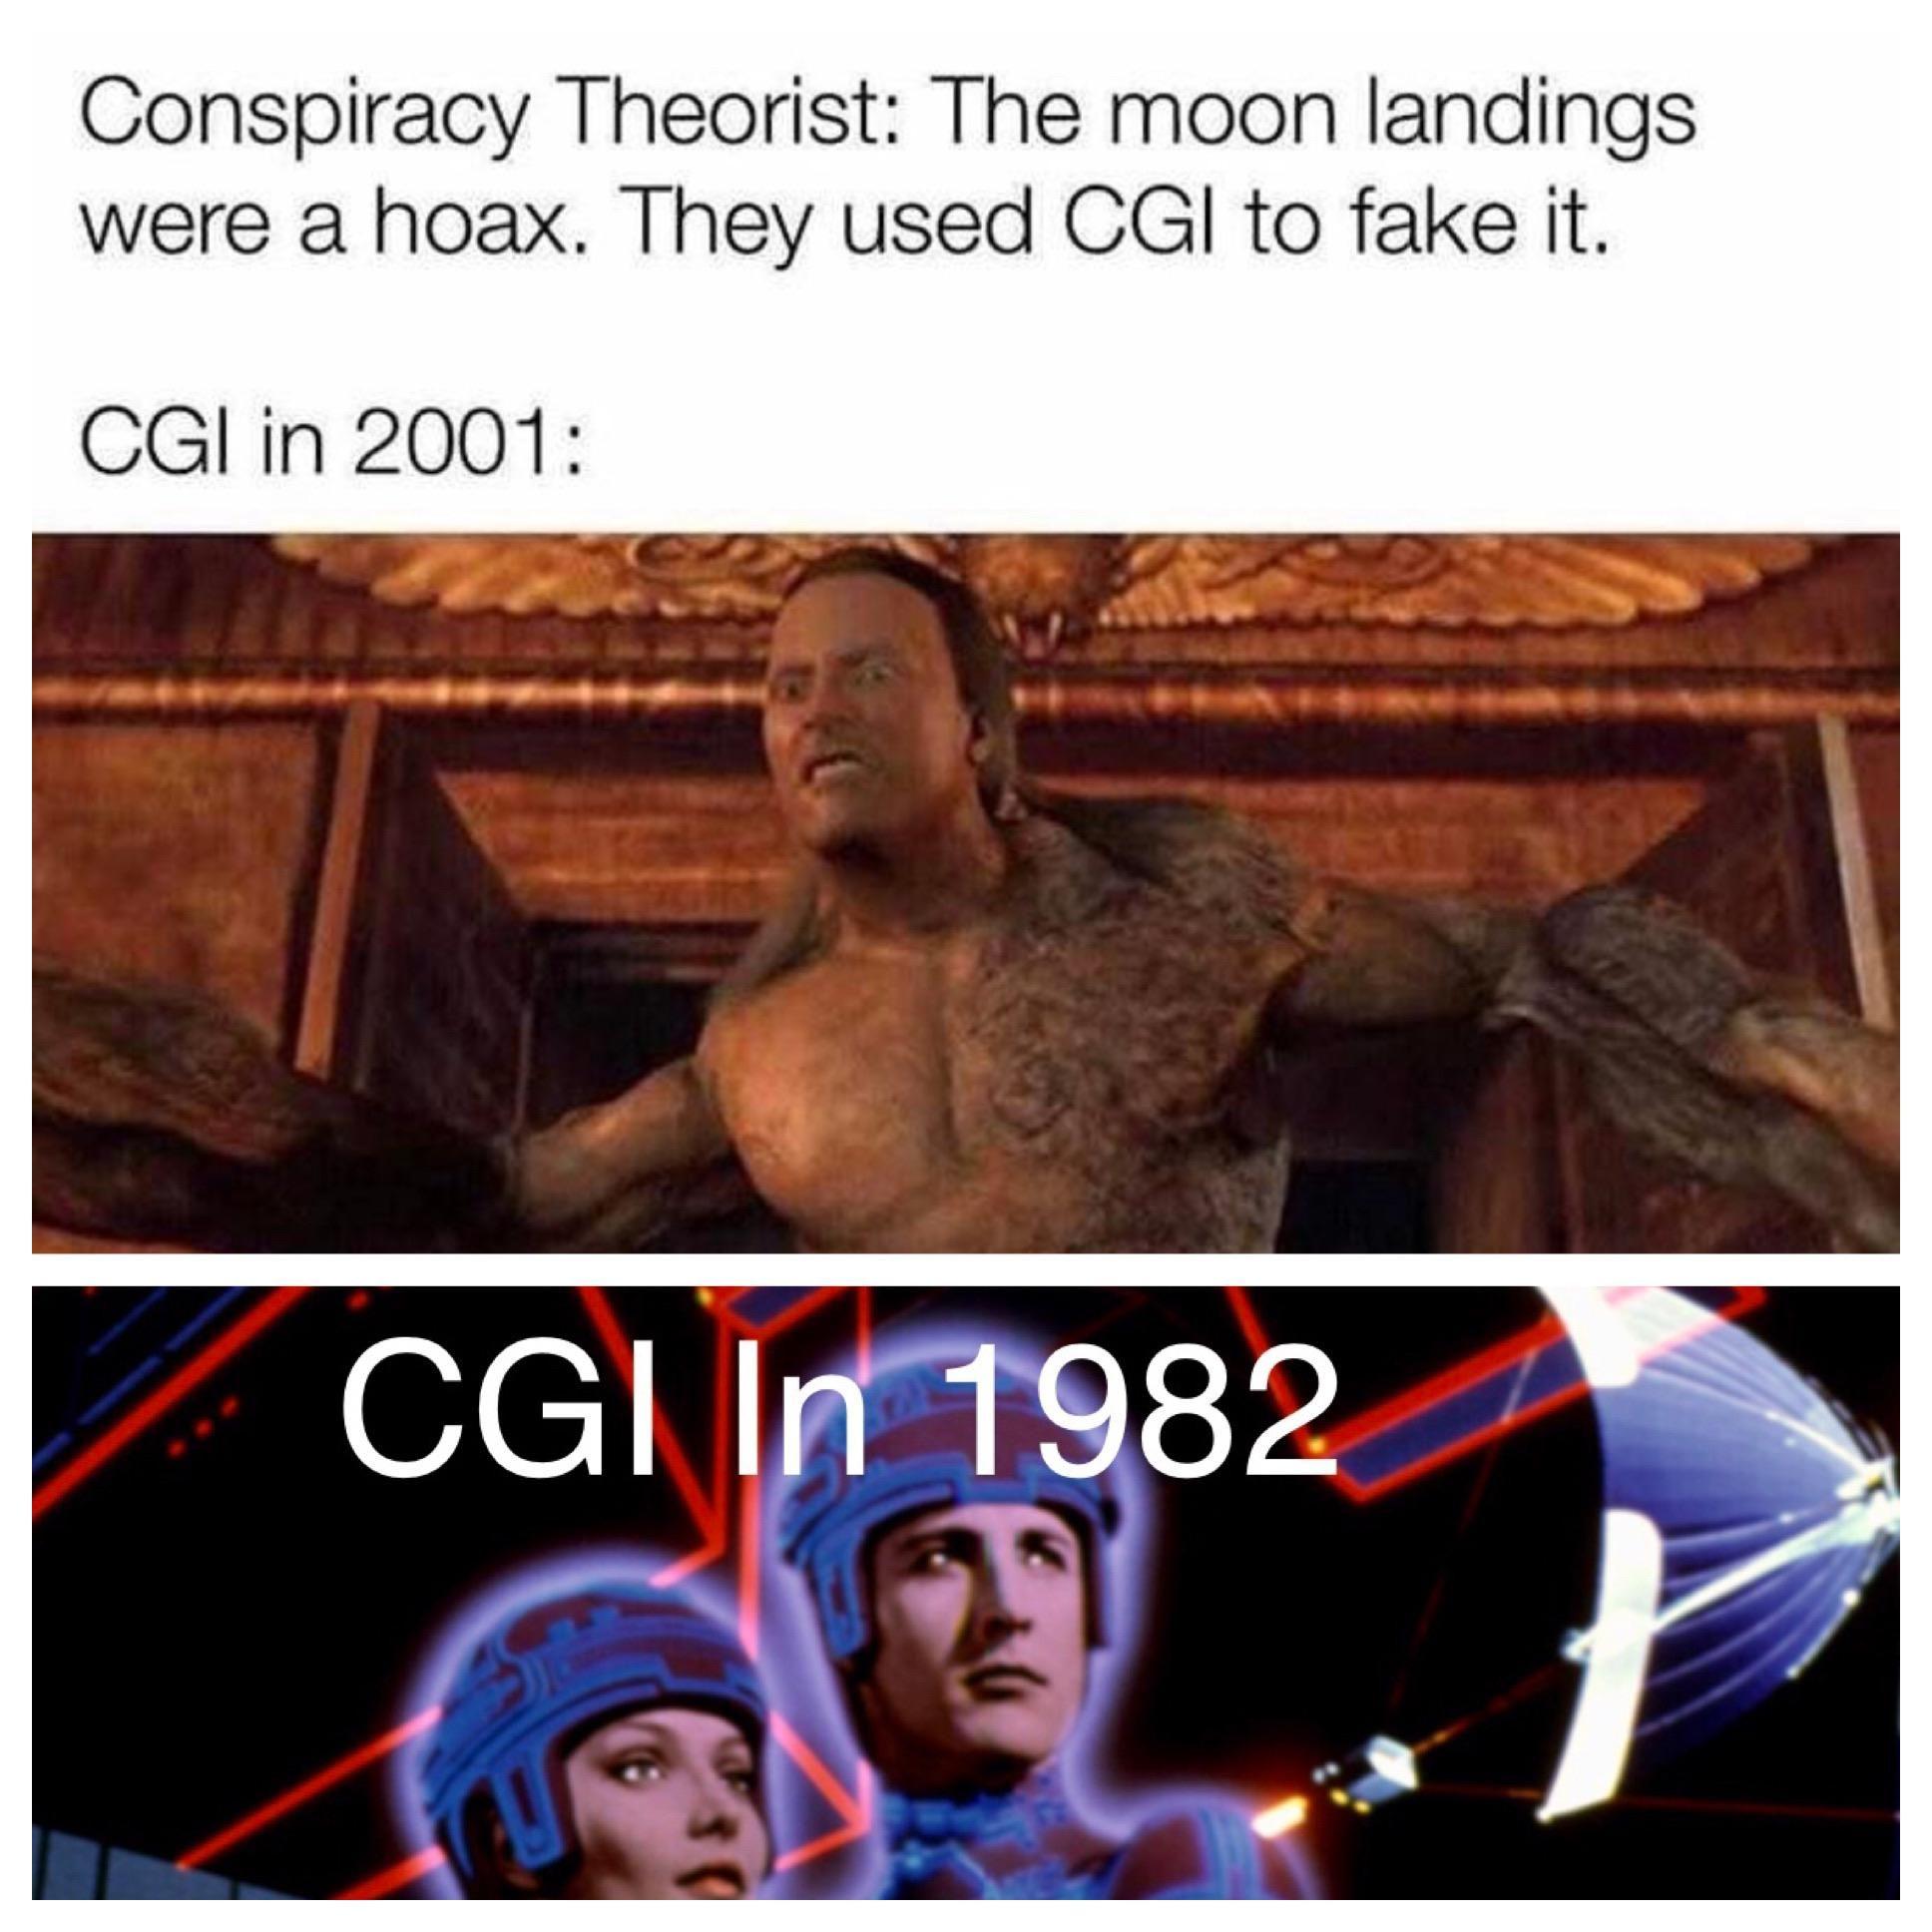 Moon landings were a hoax